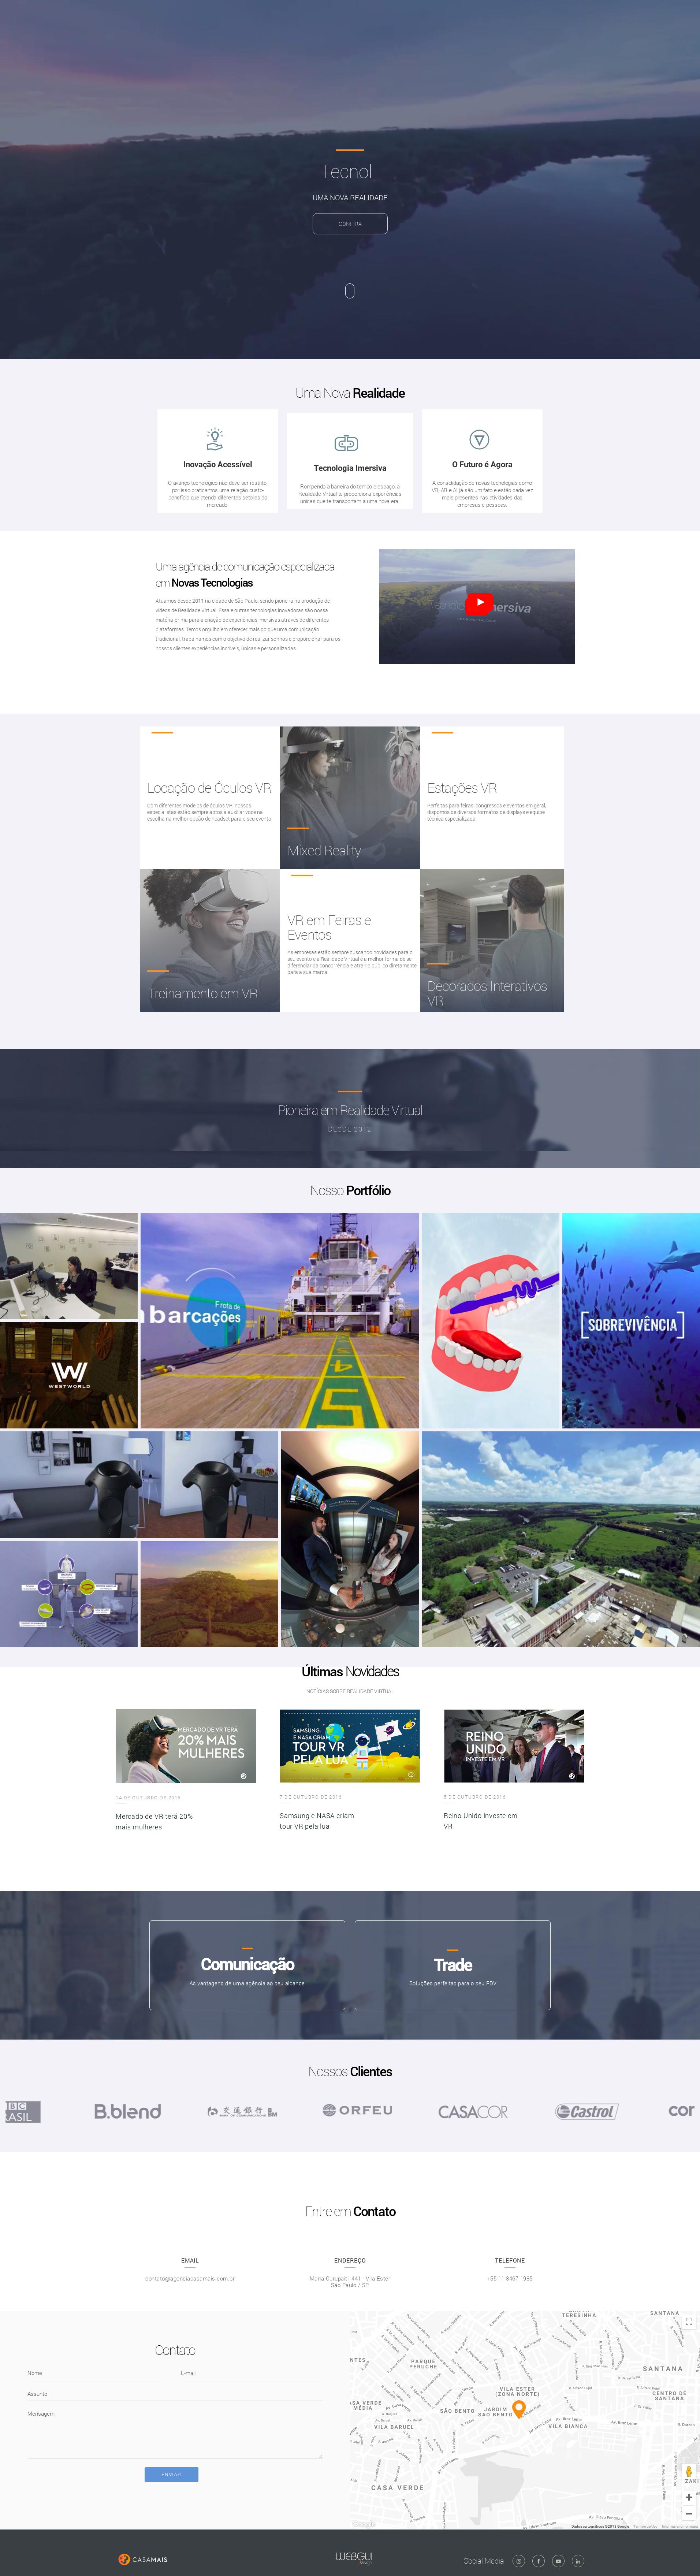 Desenvolvi Desenvolvimento Web Agência Casa Mais Realidade Virtual